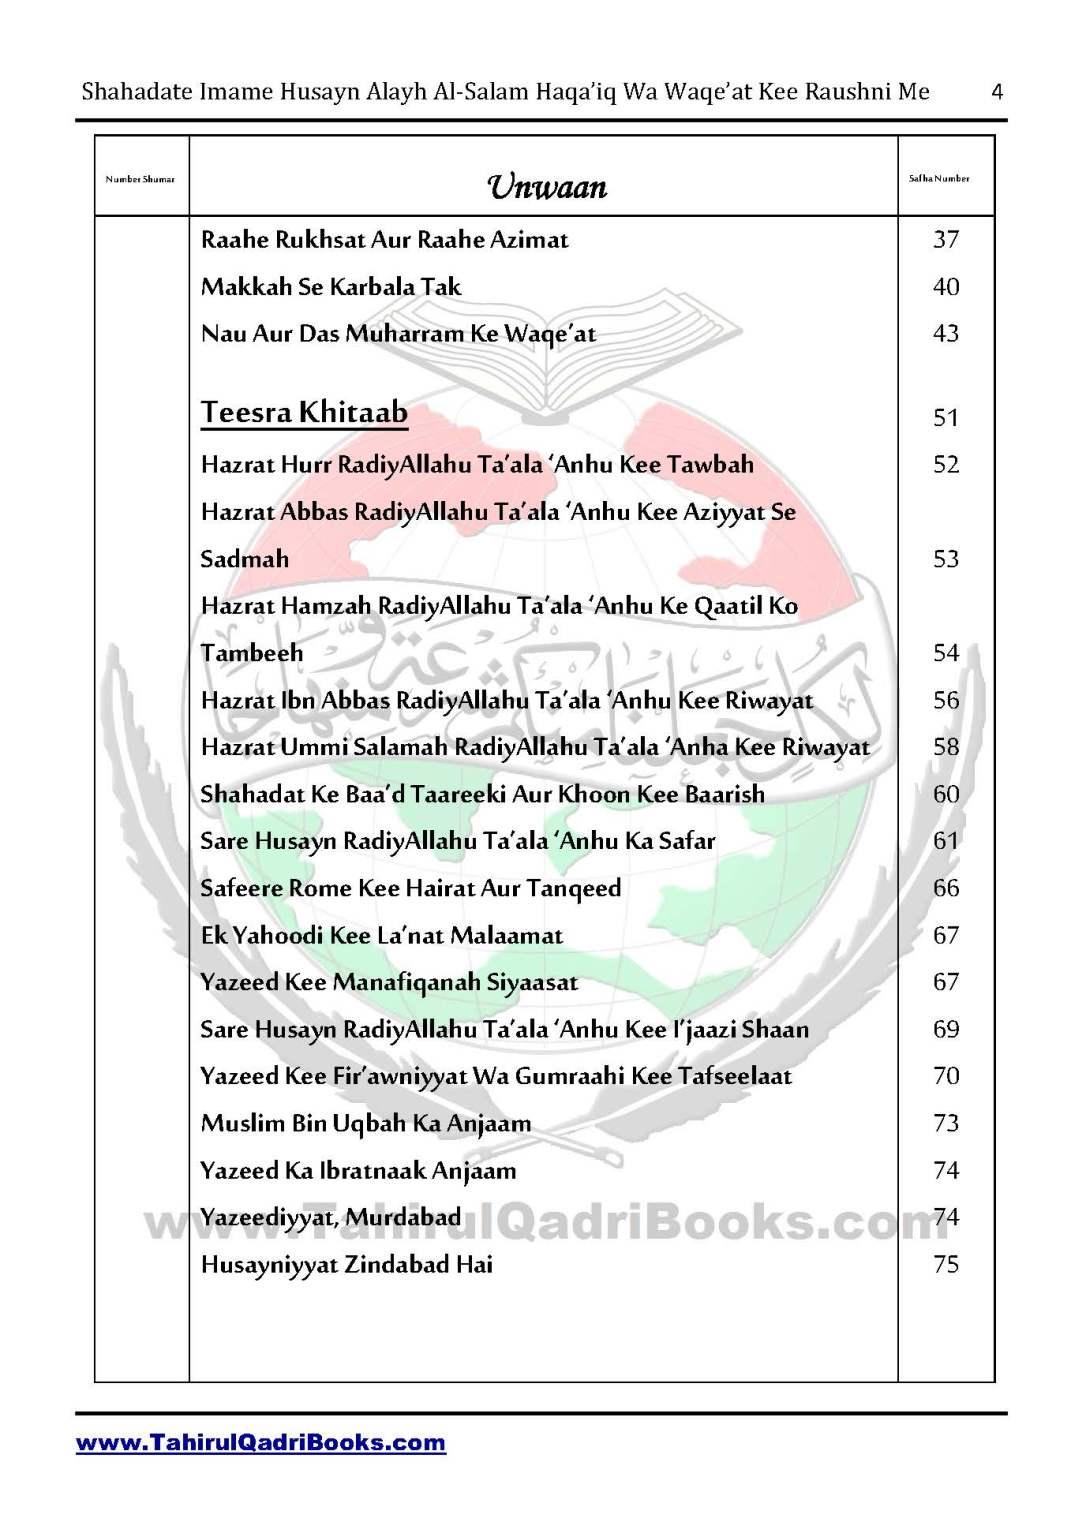 shahadate-imame-husayn-alayh-is-salam-haqaiq-wa-waqe_at-kee-raushni-me-in-roman-urdu-unlocked_Page_04